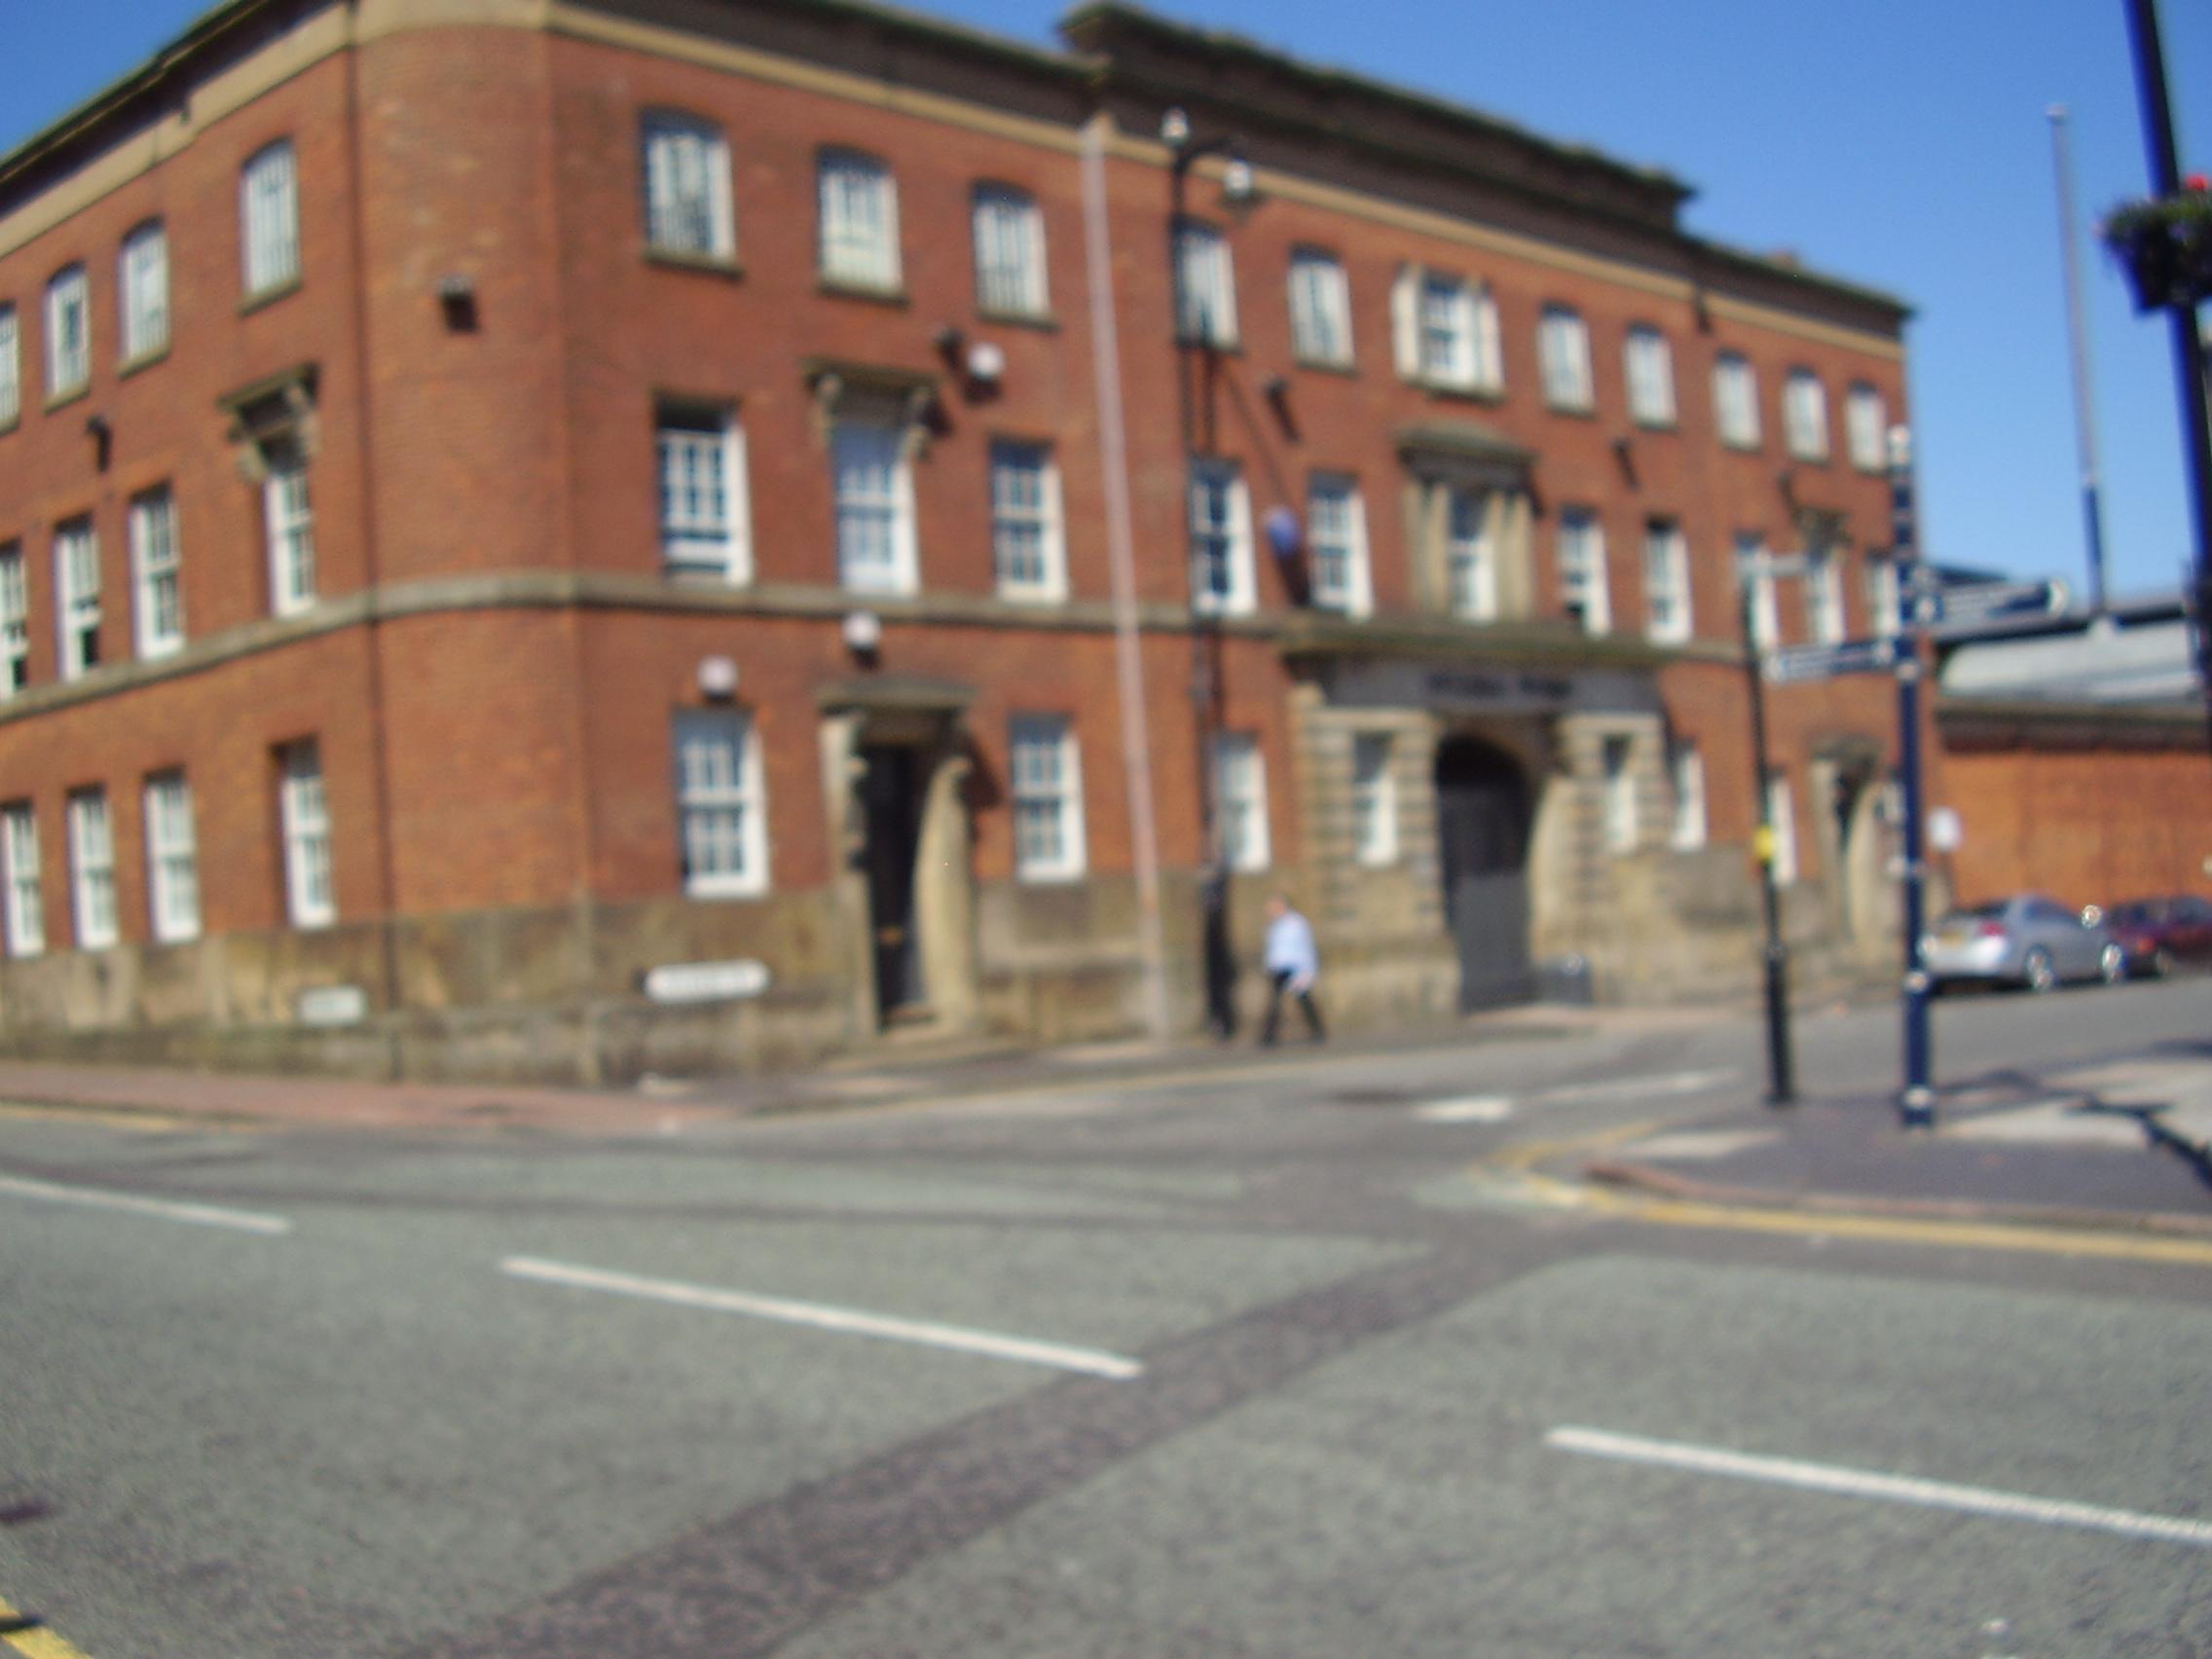 2008 Street view photo 17 of St Pauls Square Area of the Jewellery Quarter Birmingham